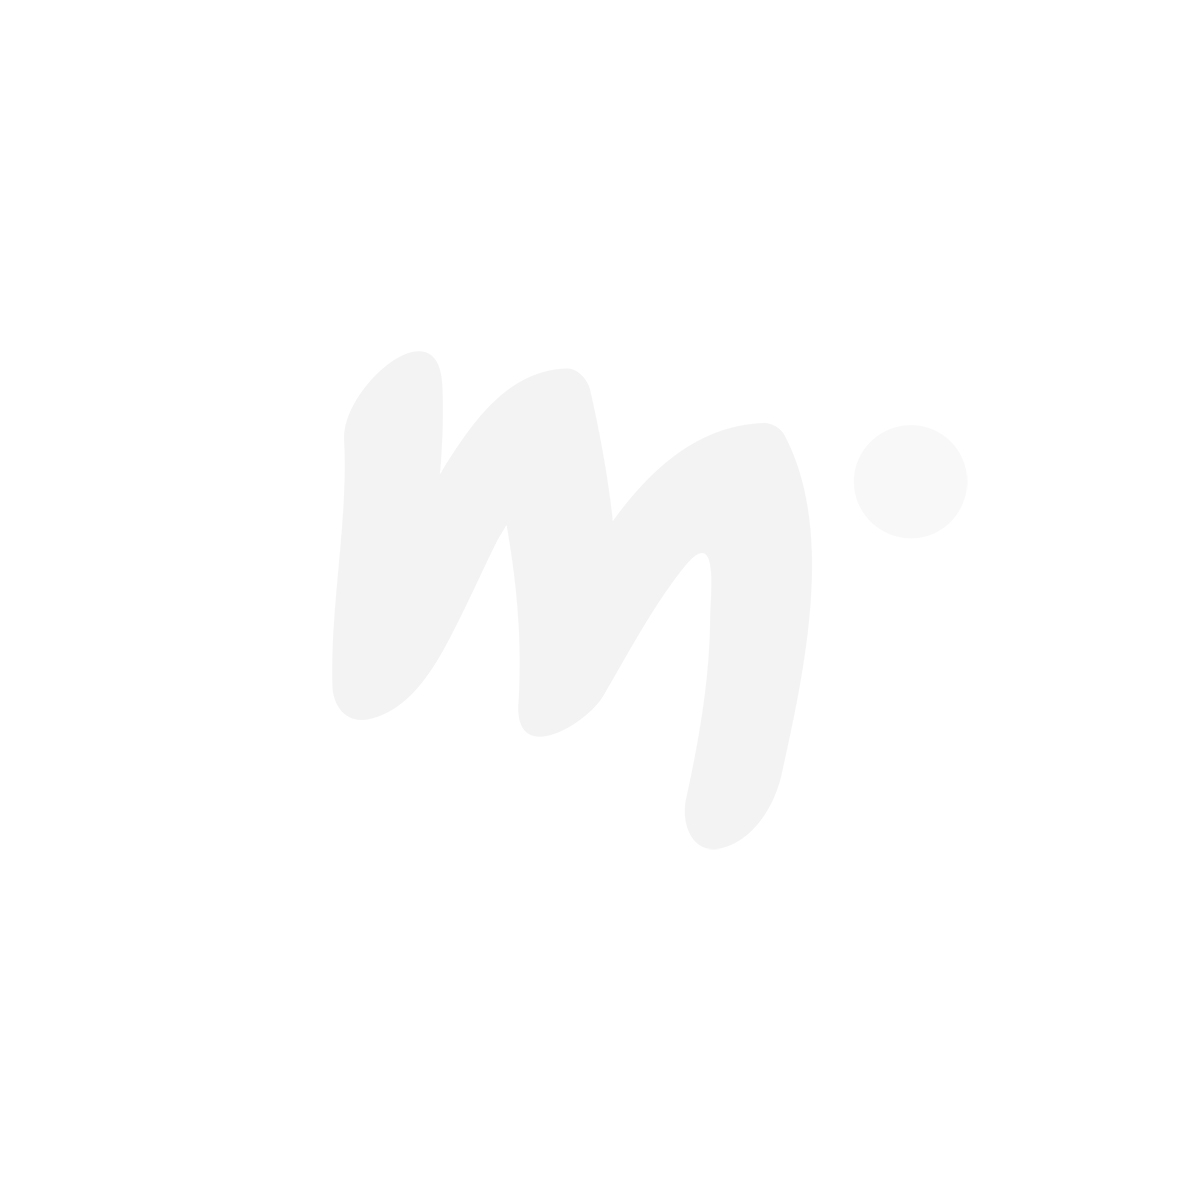 Moomin Snork's Measuring Tape